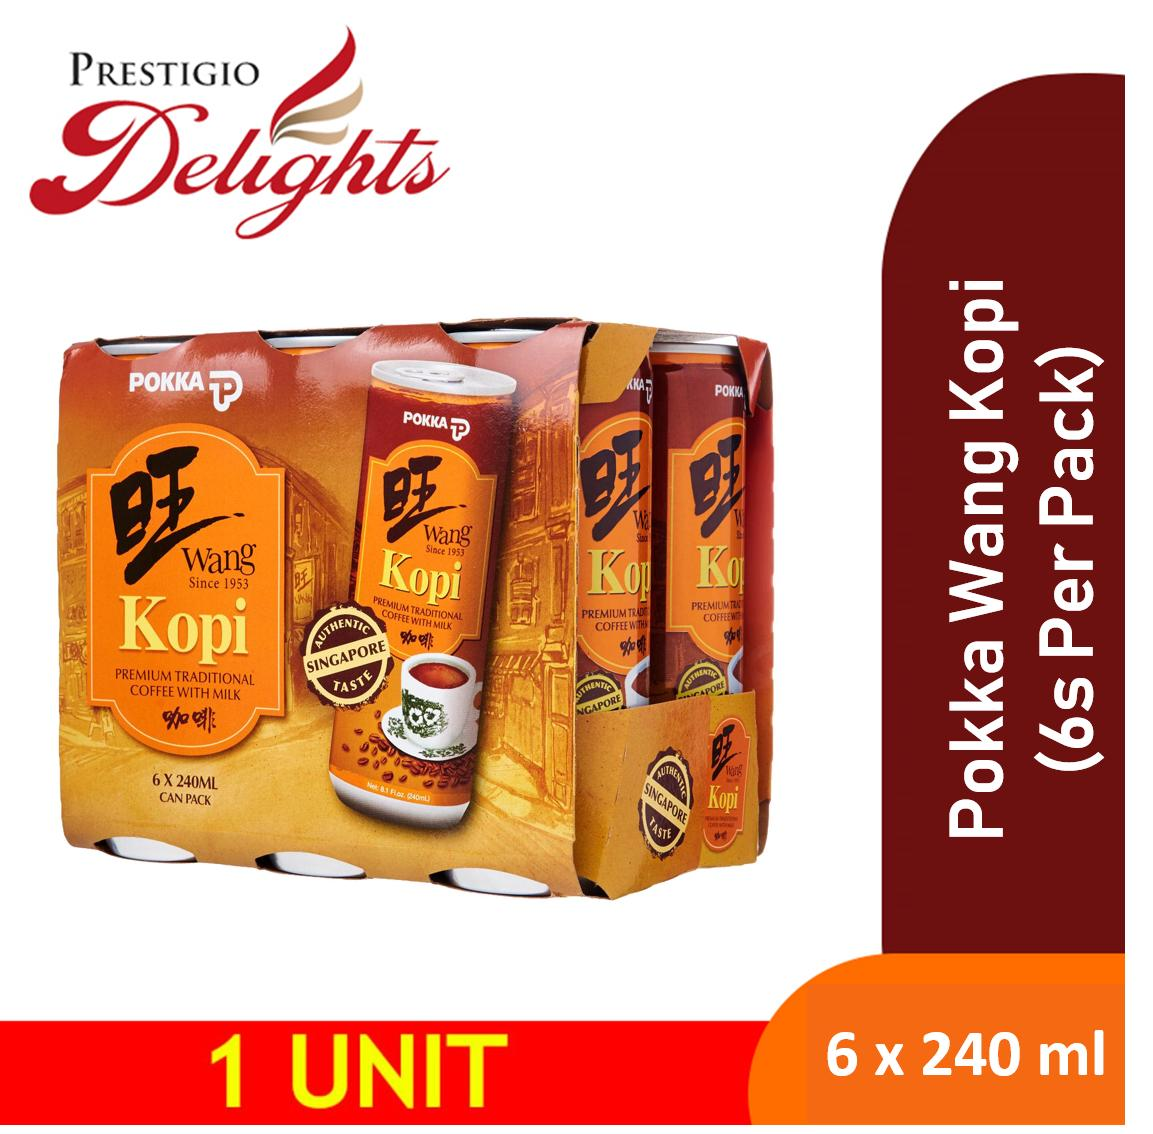 Pokka Wang Kopi 6 Cans X 240ml Drink Sale By Prestigio Delights.